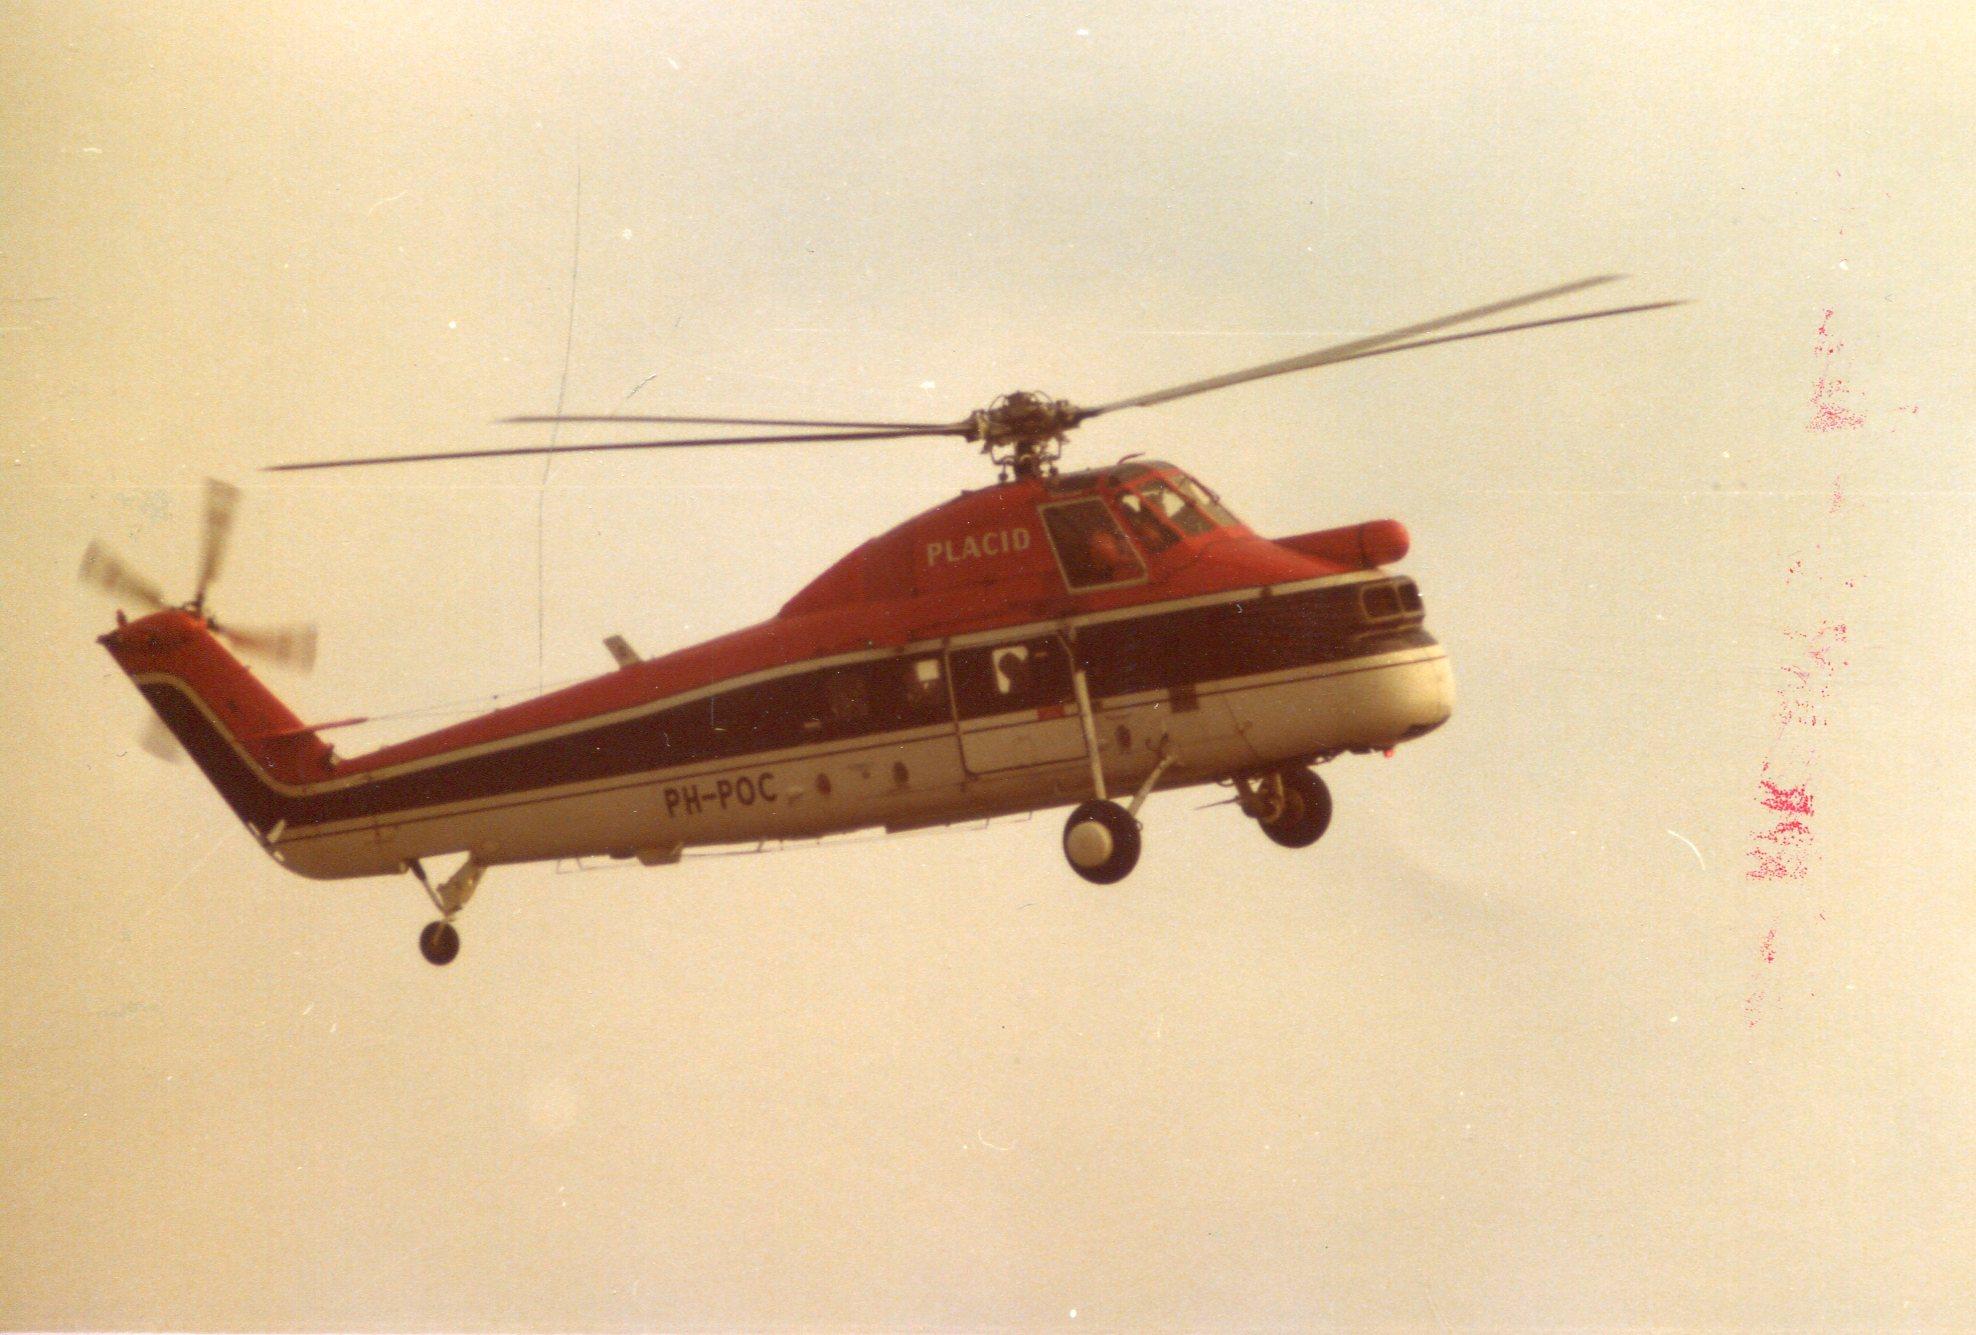 Naam: Den Helder , april 1977 (3).jpg Bekeken: 490 Grootte: 334,4 KB